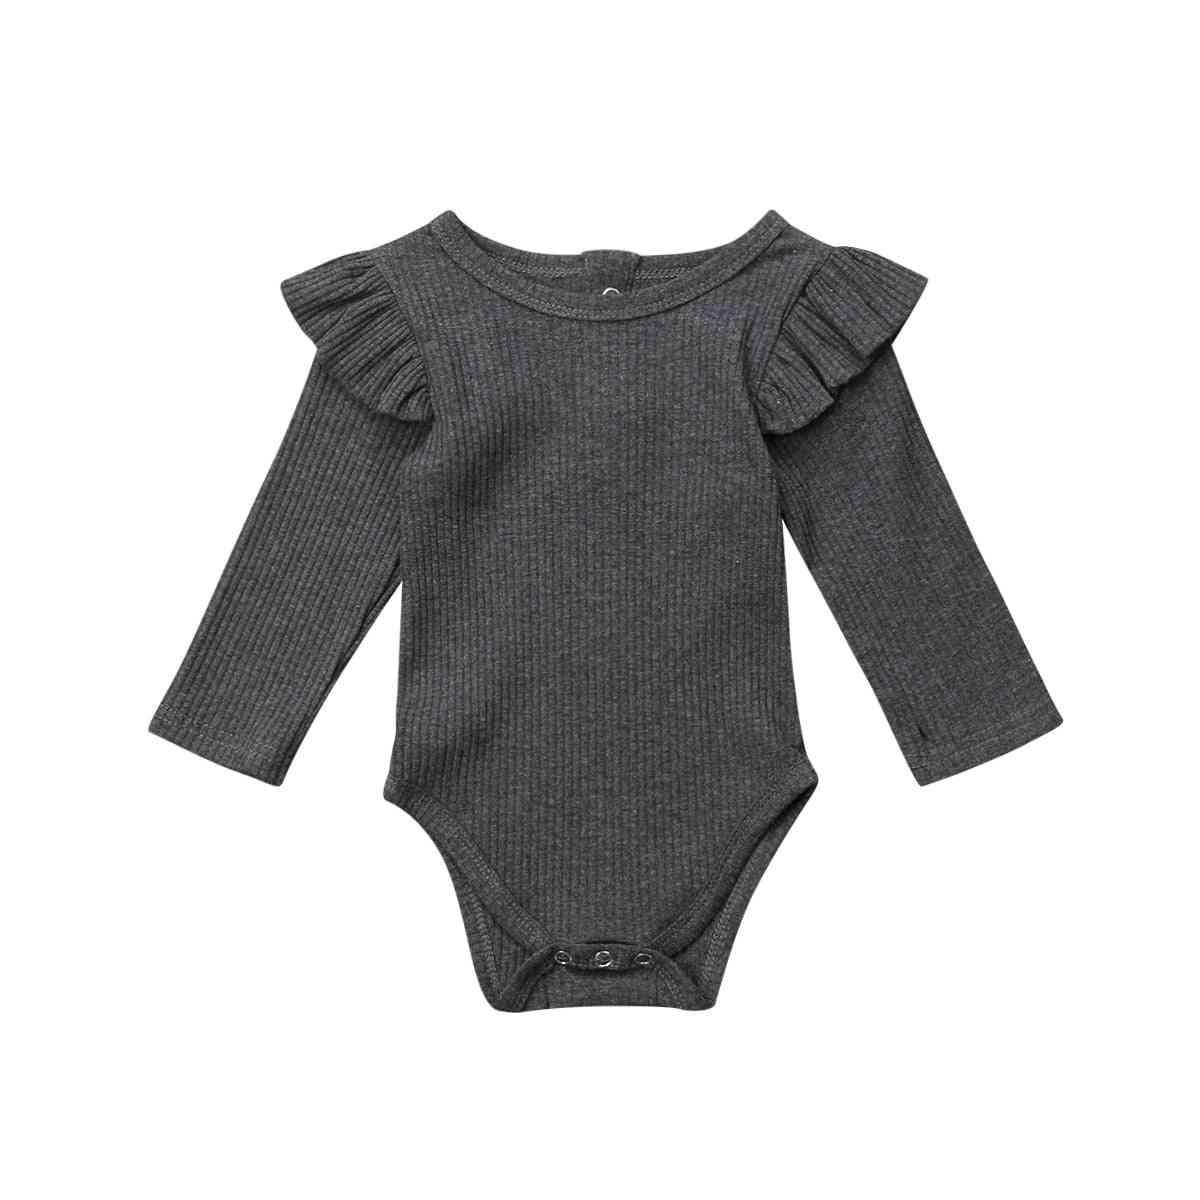 Newborn Baby / Romper, Long Sleeve Jumpsuit Bodysuit,  Autumn Winter Clothes